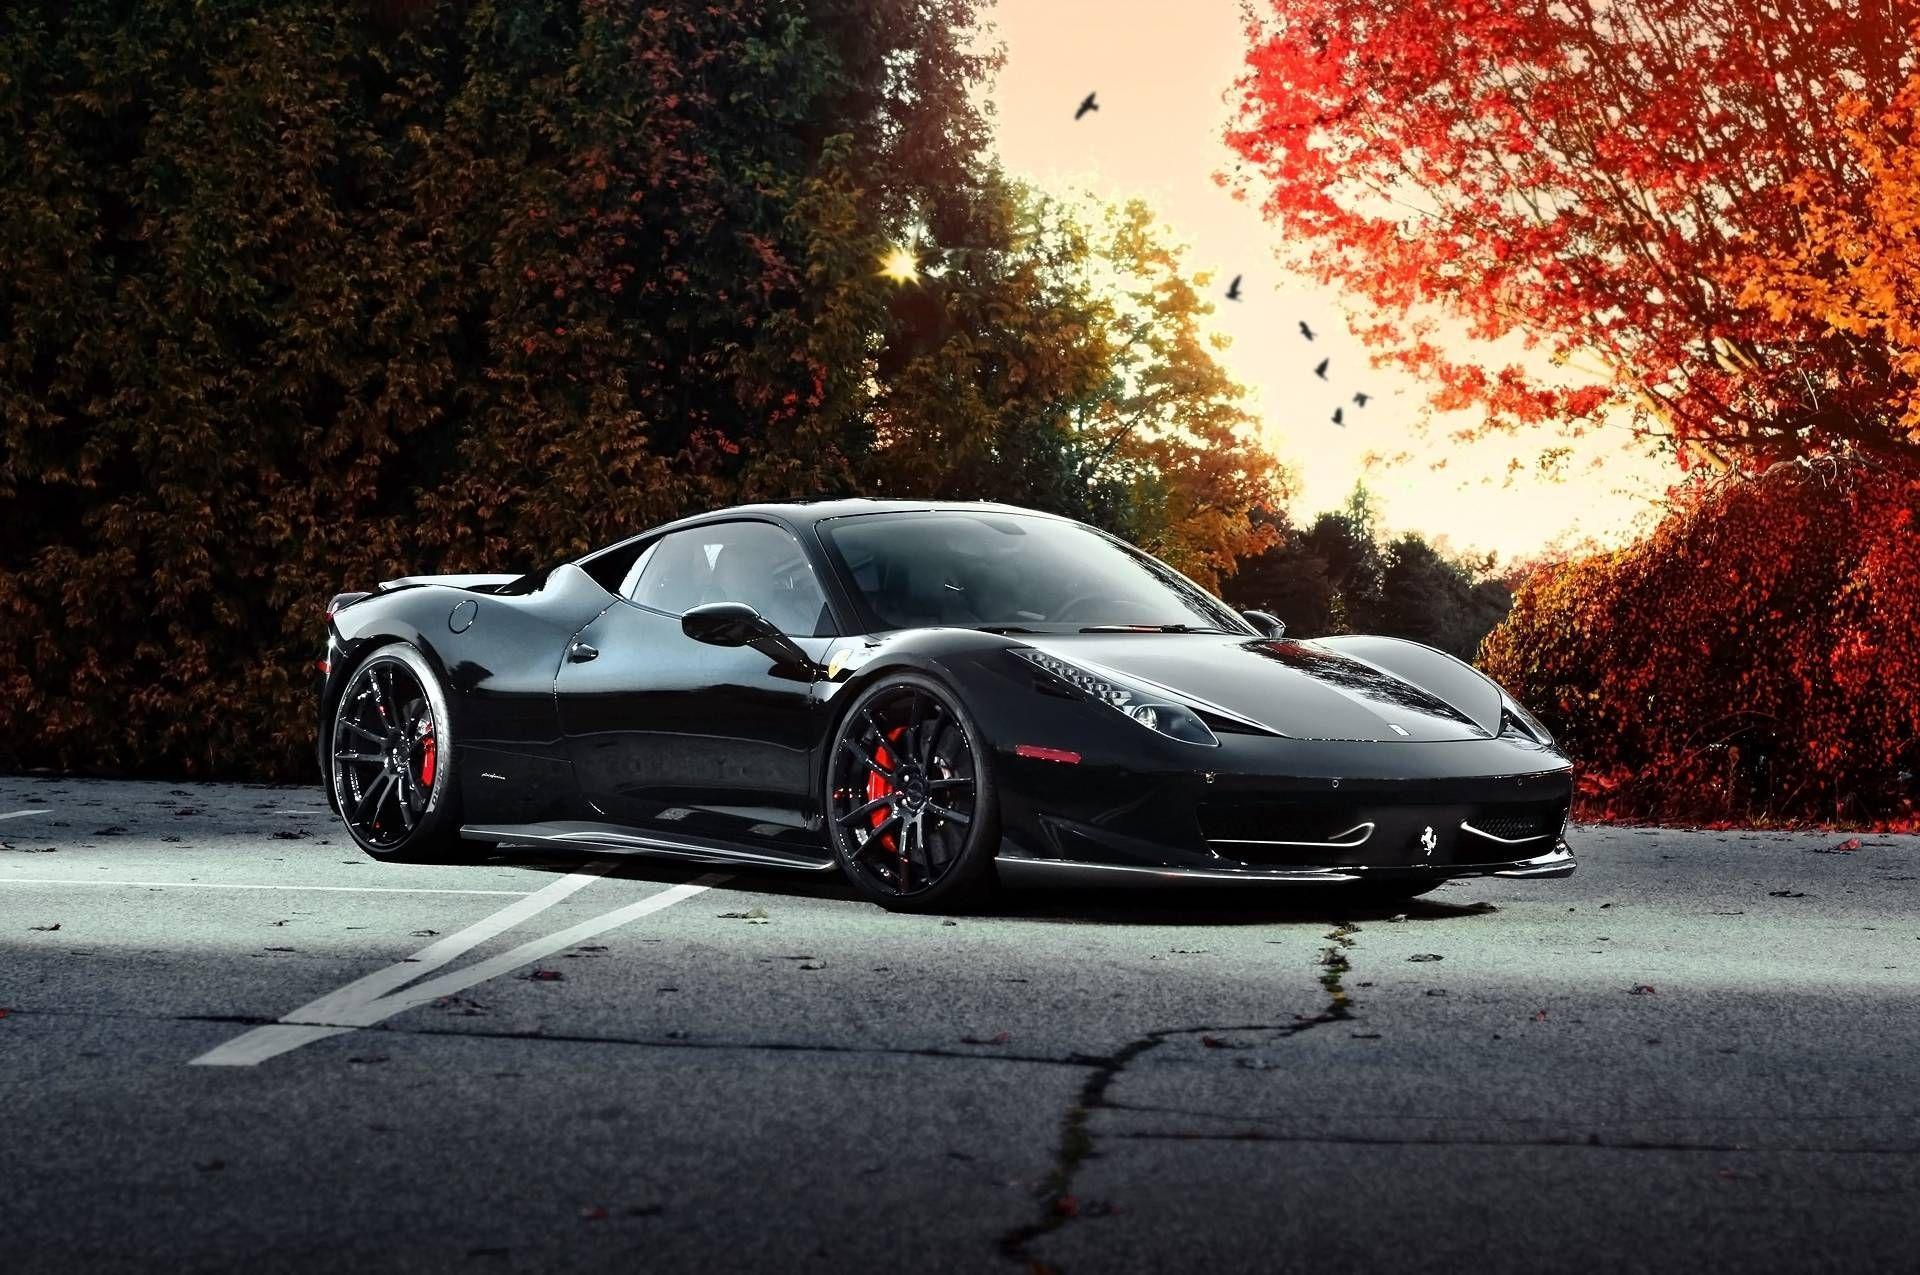 Black Ferrari Wallpapers - Top Free Black Ferrari ...